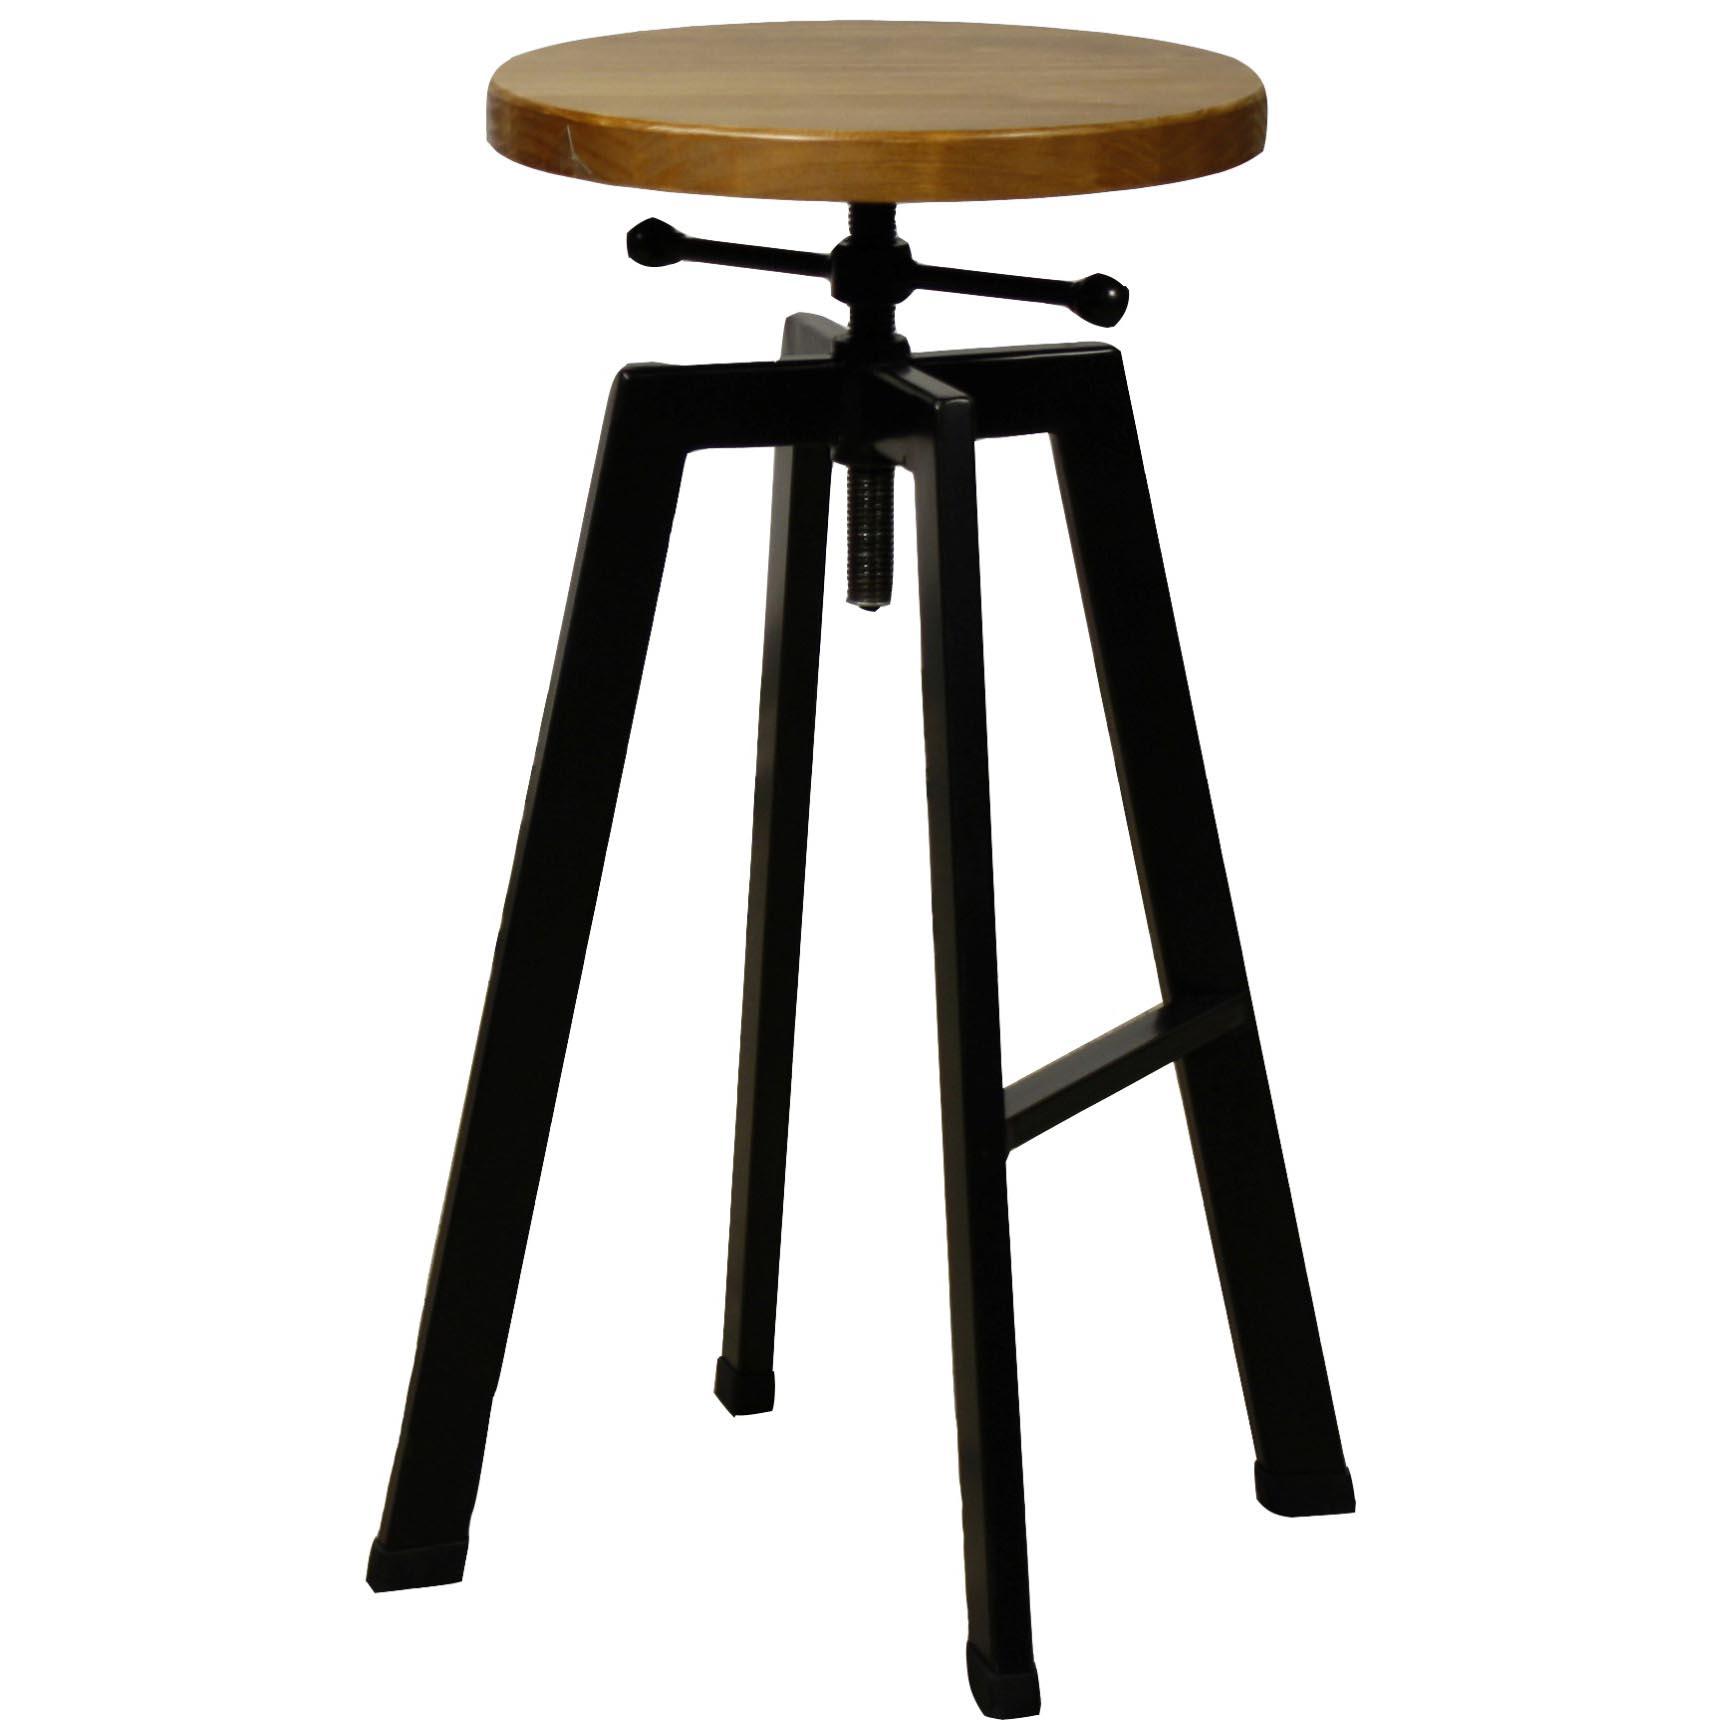 958613 Npd Home Furniture Wholesale Lifestyle Furnishings